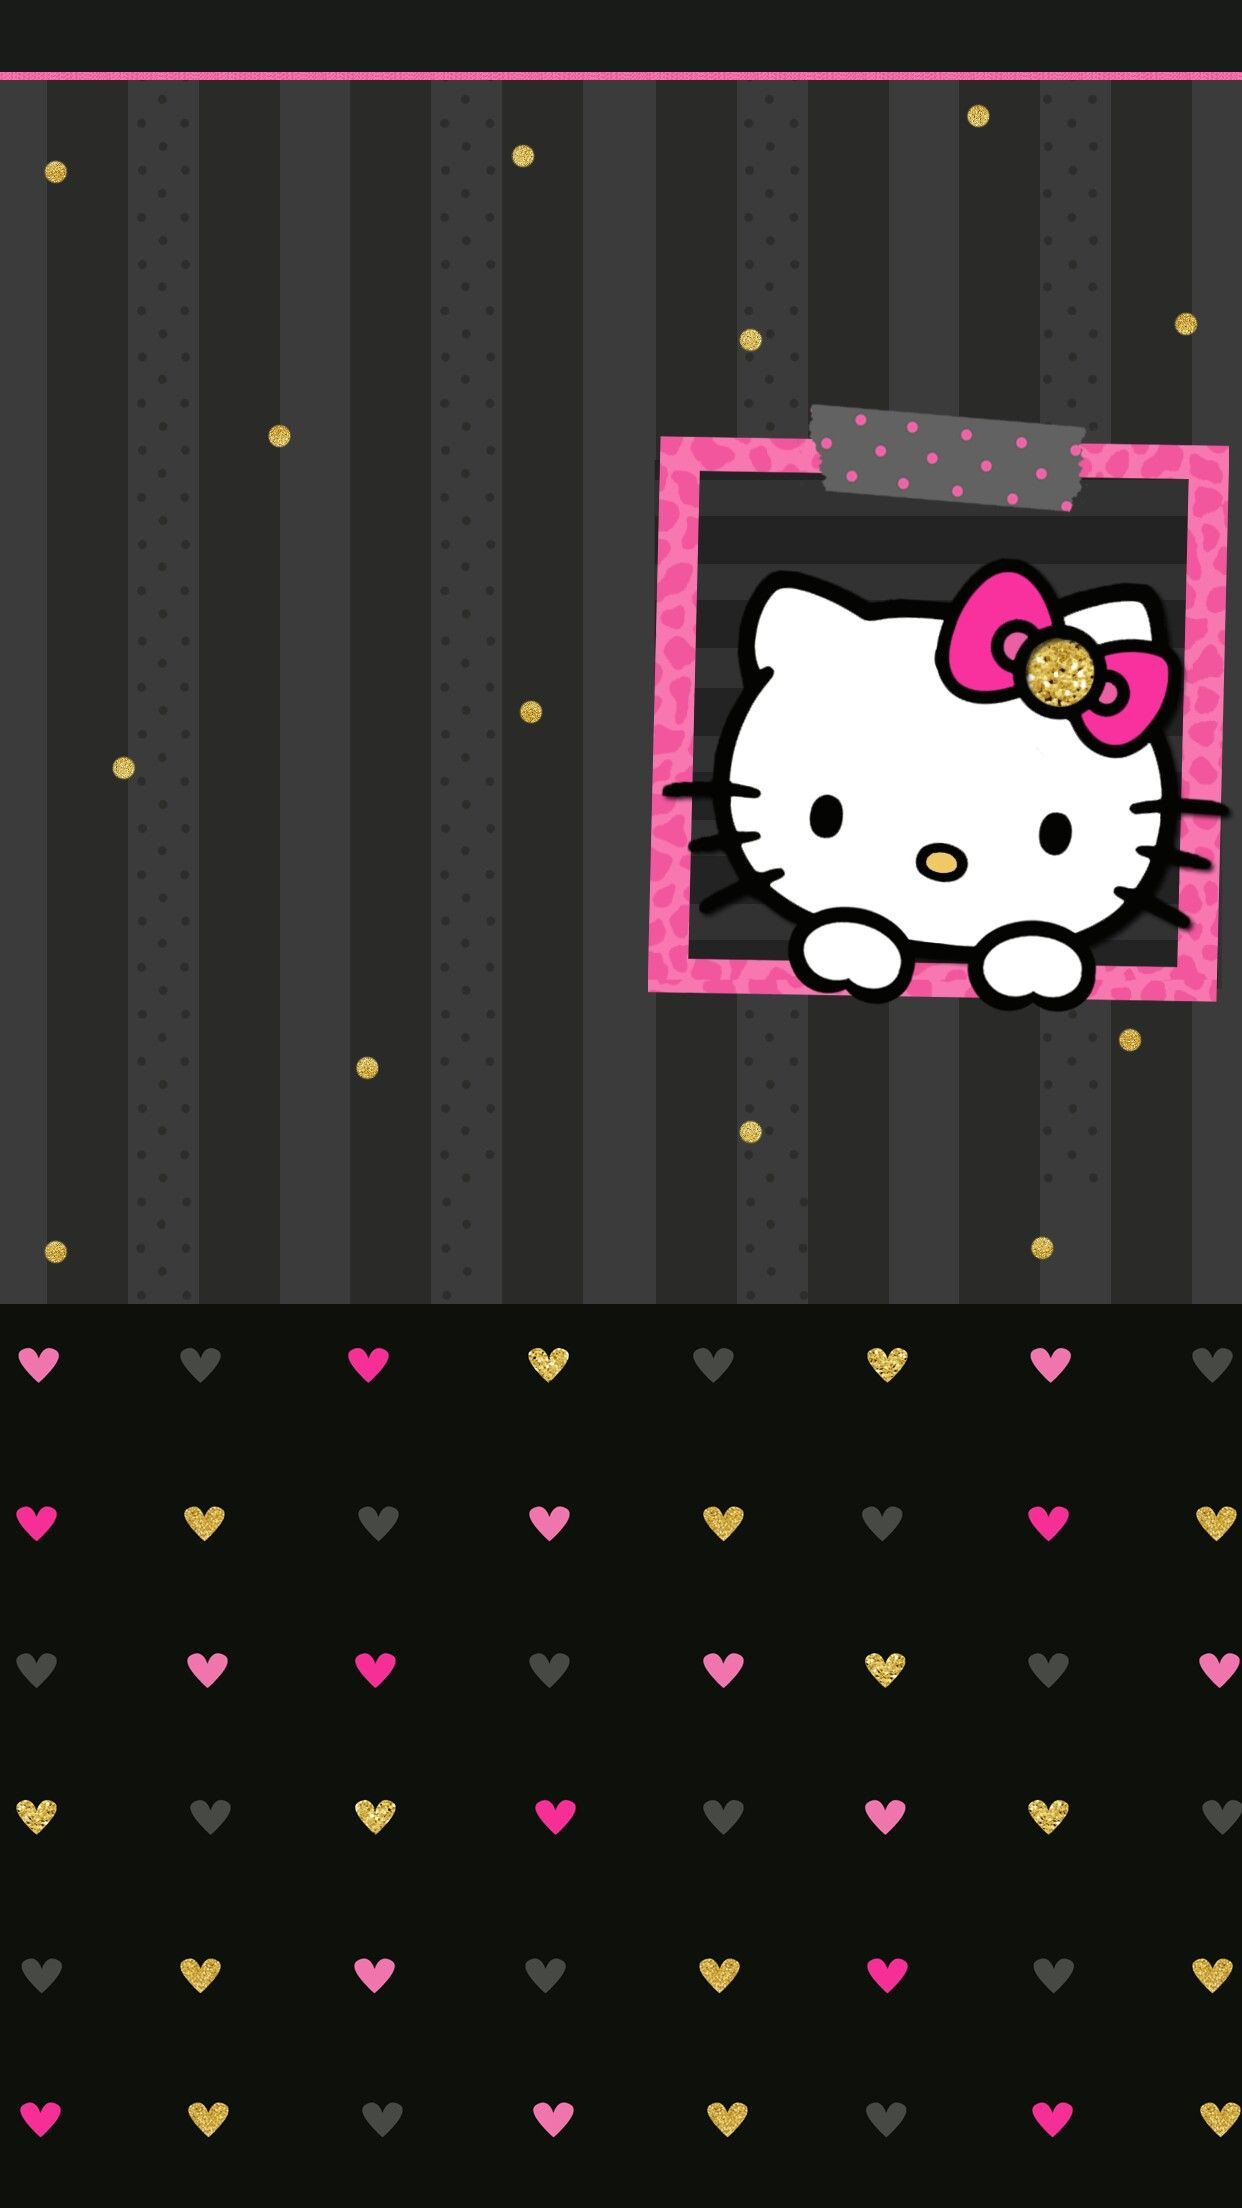 Beautiful Wallpaper Hello Kitty Ipod Touch - 3ab2cb7d9ee9df2e2d3d5db8493b653f  Pic_91981.jpg